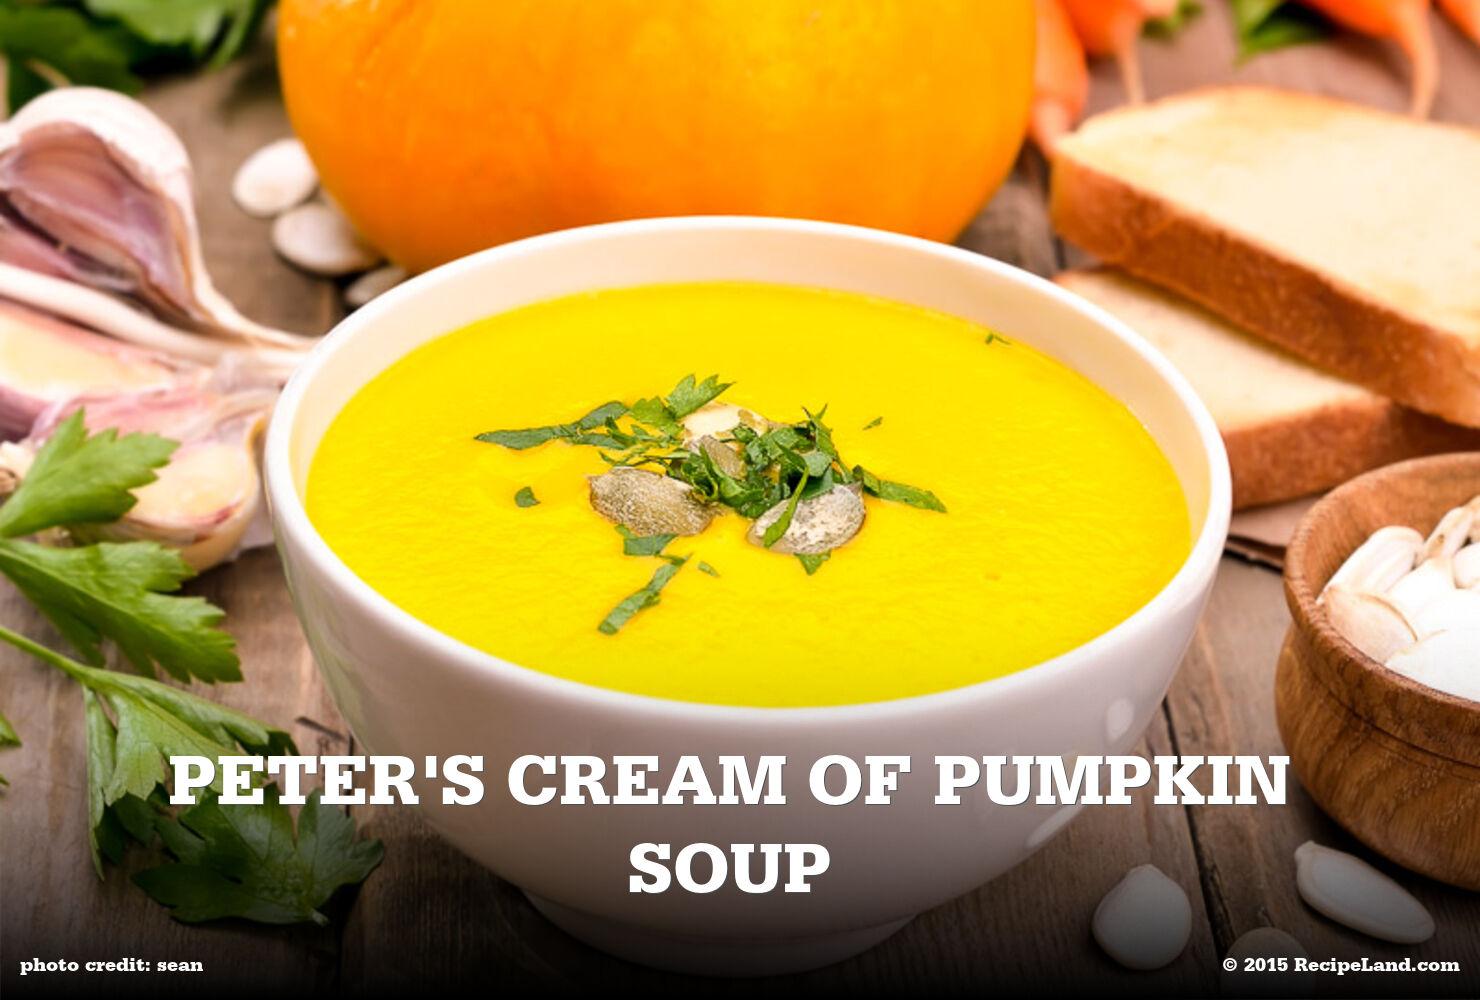 Peter's Cream of Pumpkin Soup